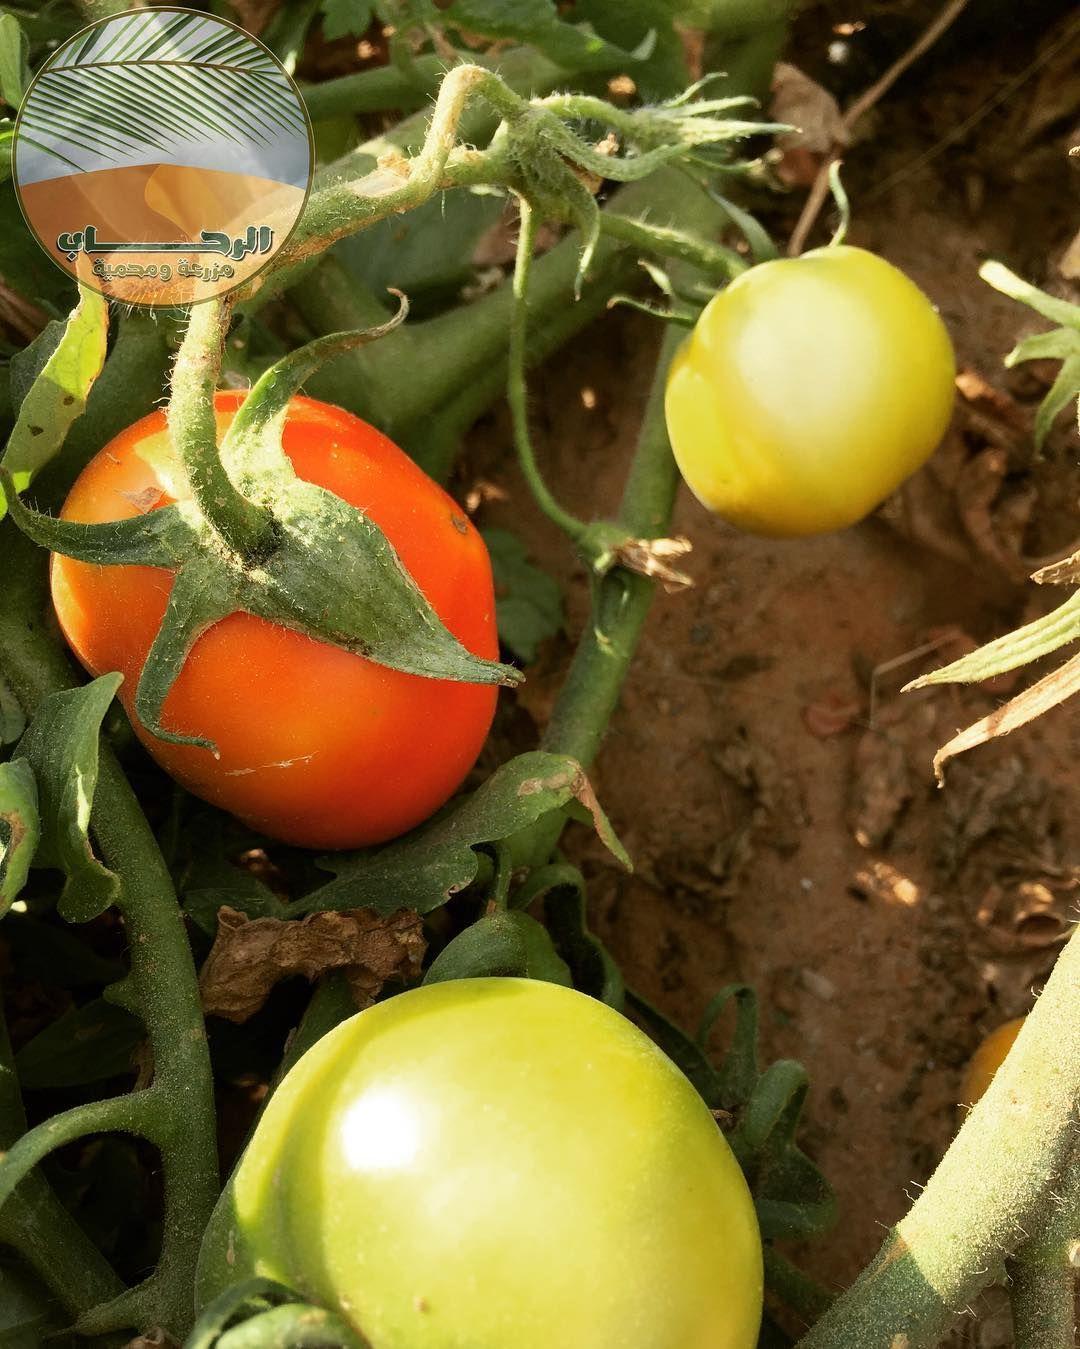 Alrehab C الرحــــــــــاب On Instagram زراعة الطماطم الامارات مزارع Tomato Cherry Tomato Vegetable Farming Healthy Garden Vertical Farming